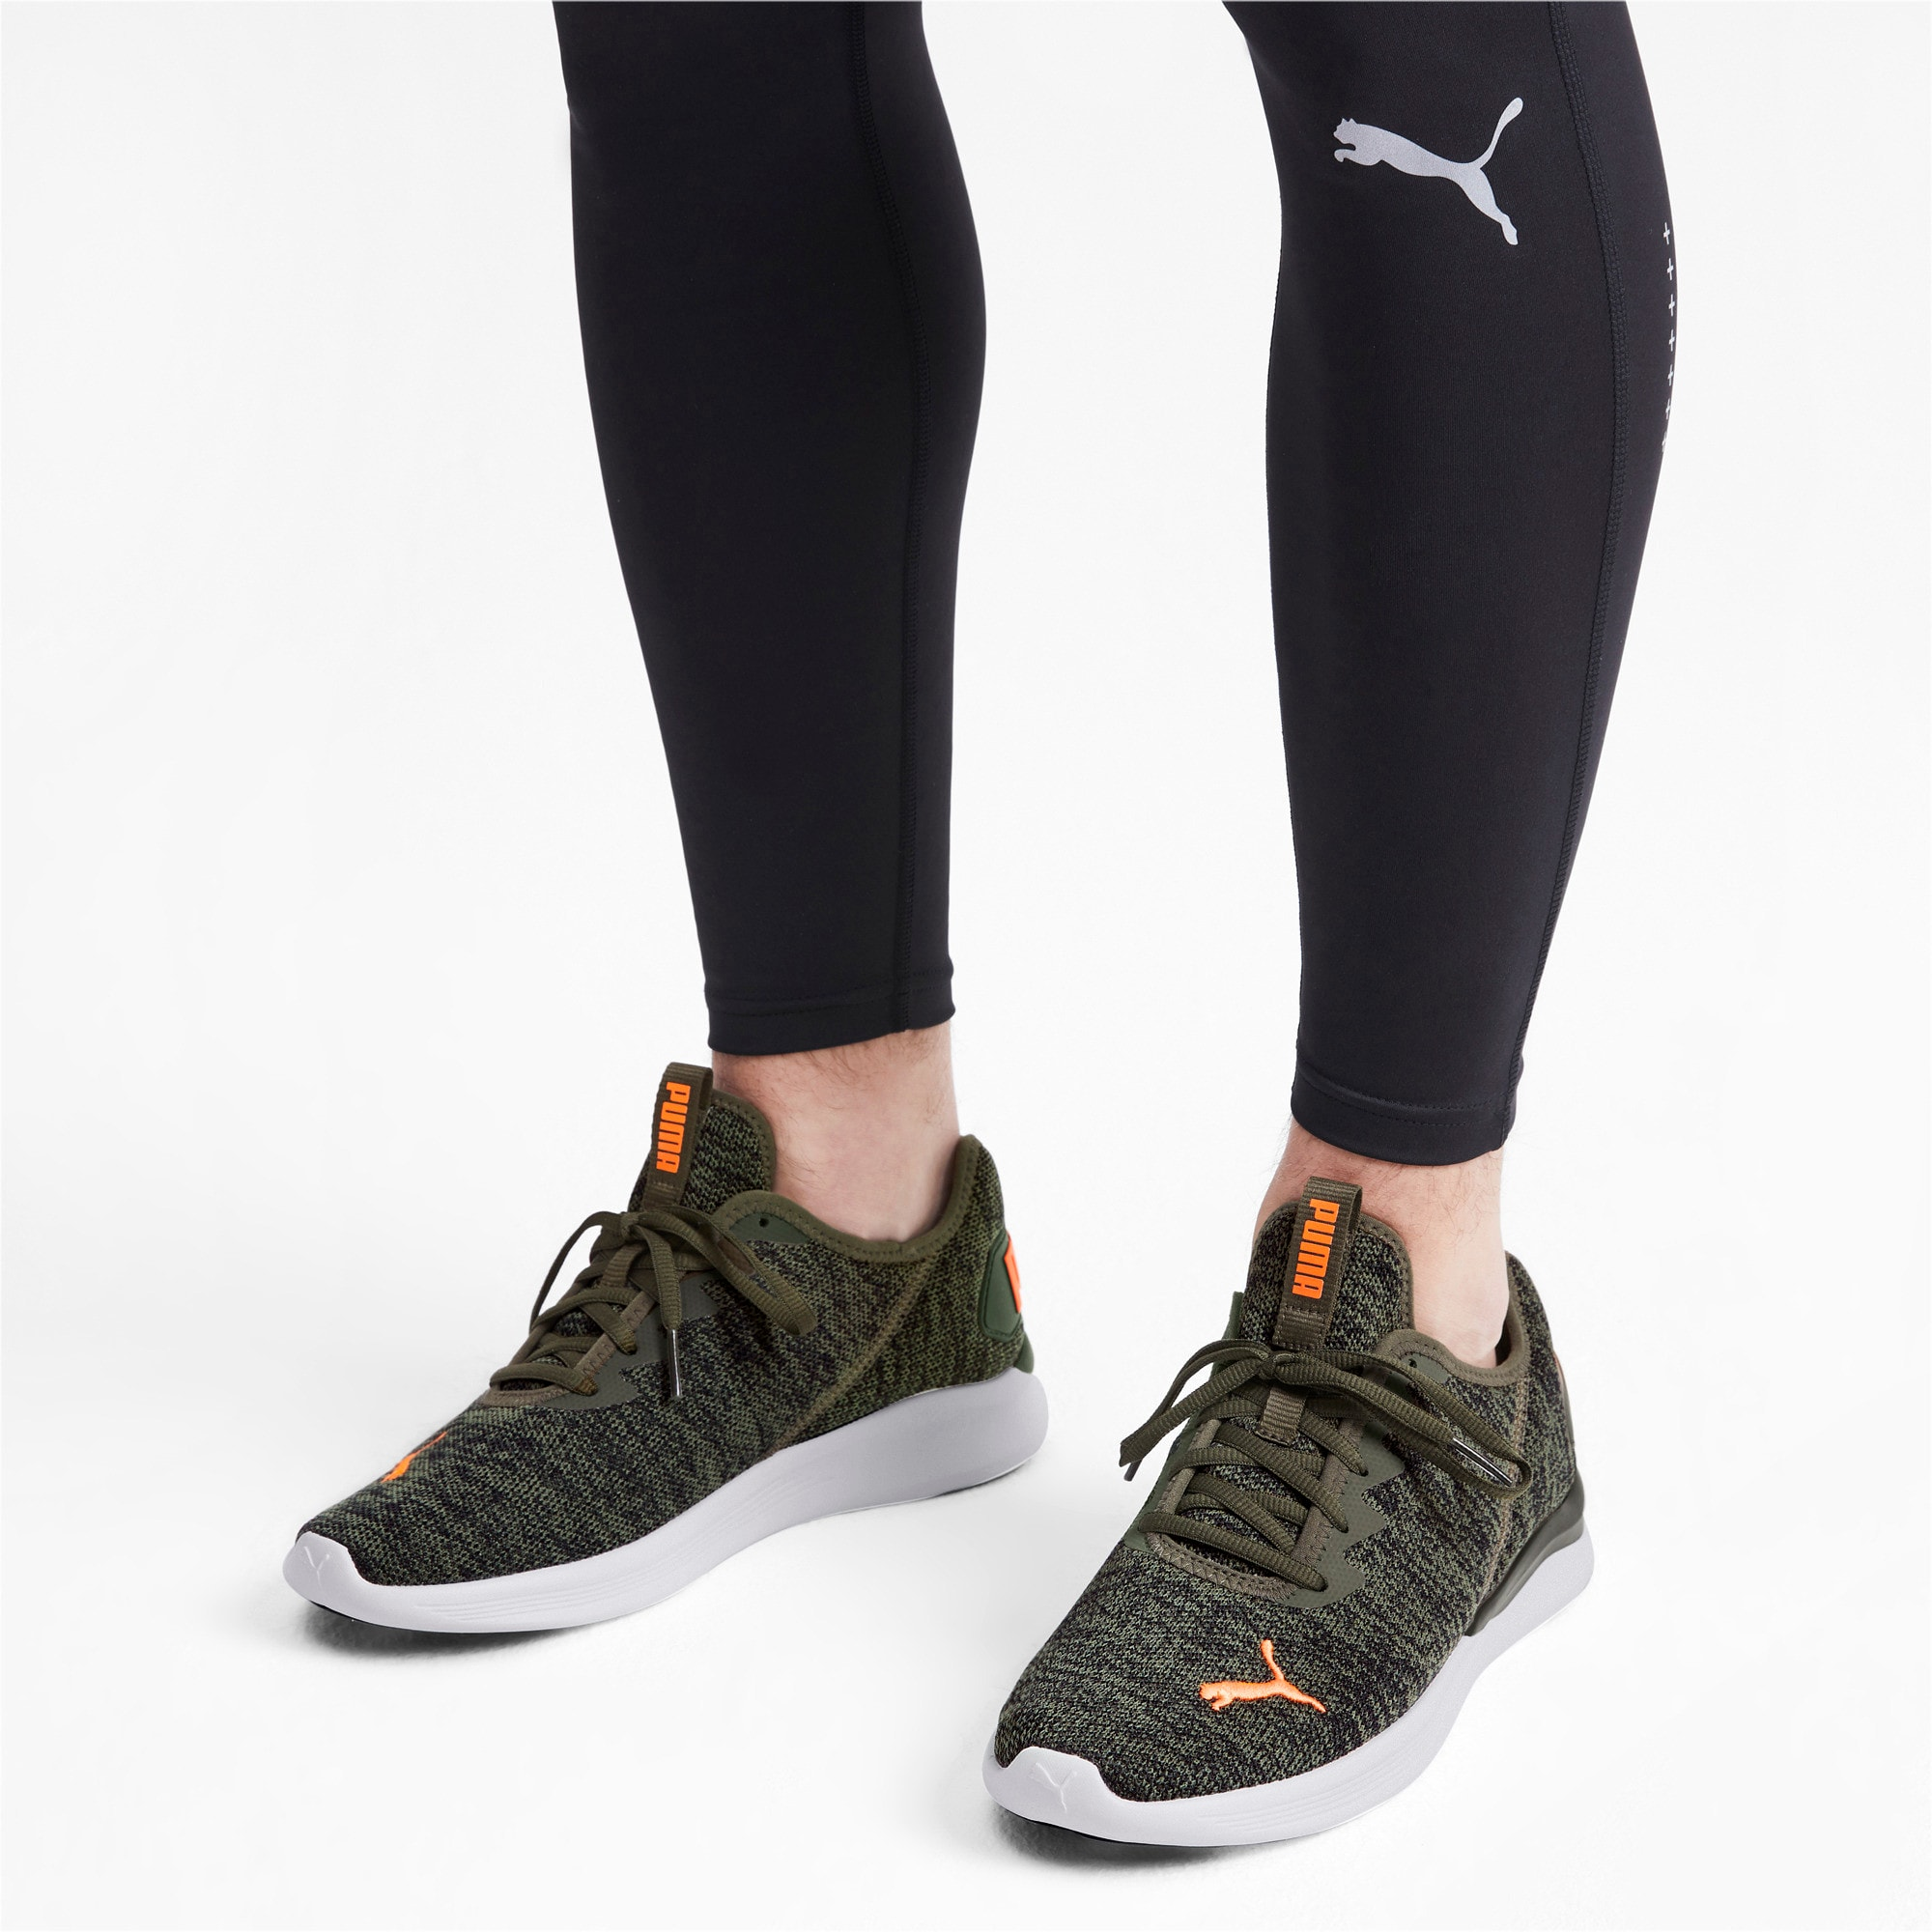 Thumbnail 4 of Ballast Men's Running Shoes, Forest Night-Black-Orange, medium-IND